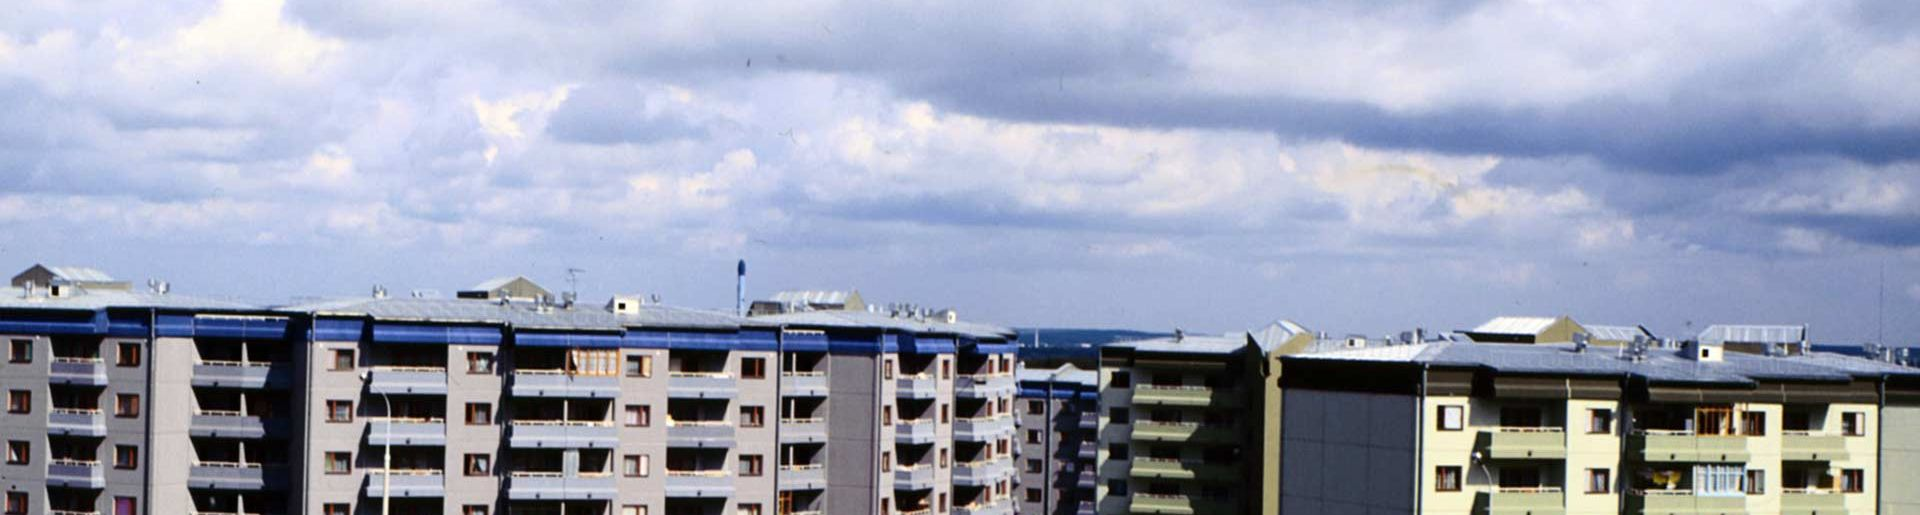 Slonim Military Housing